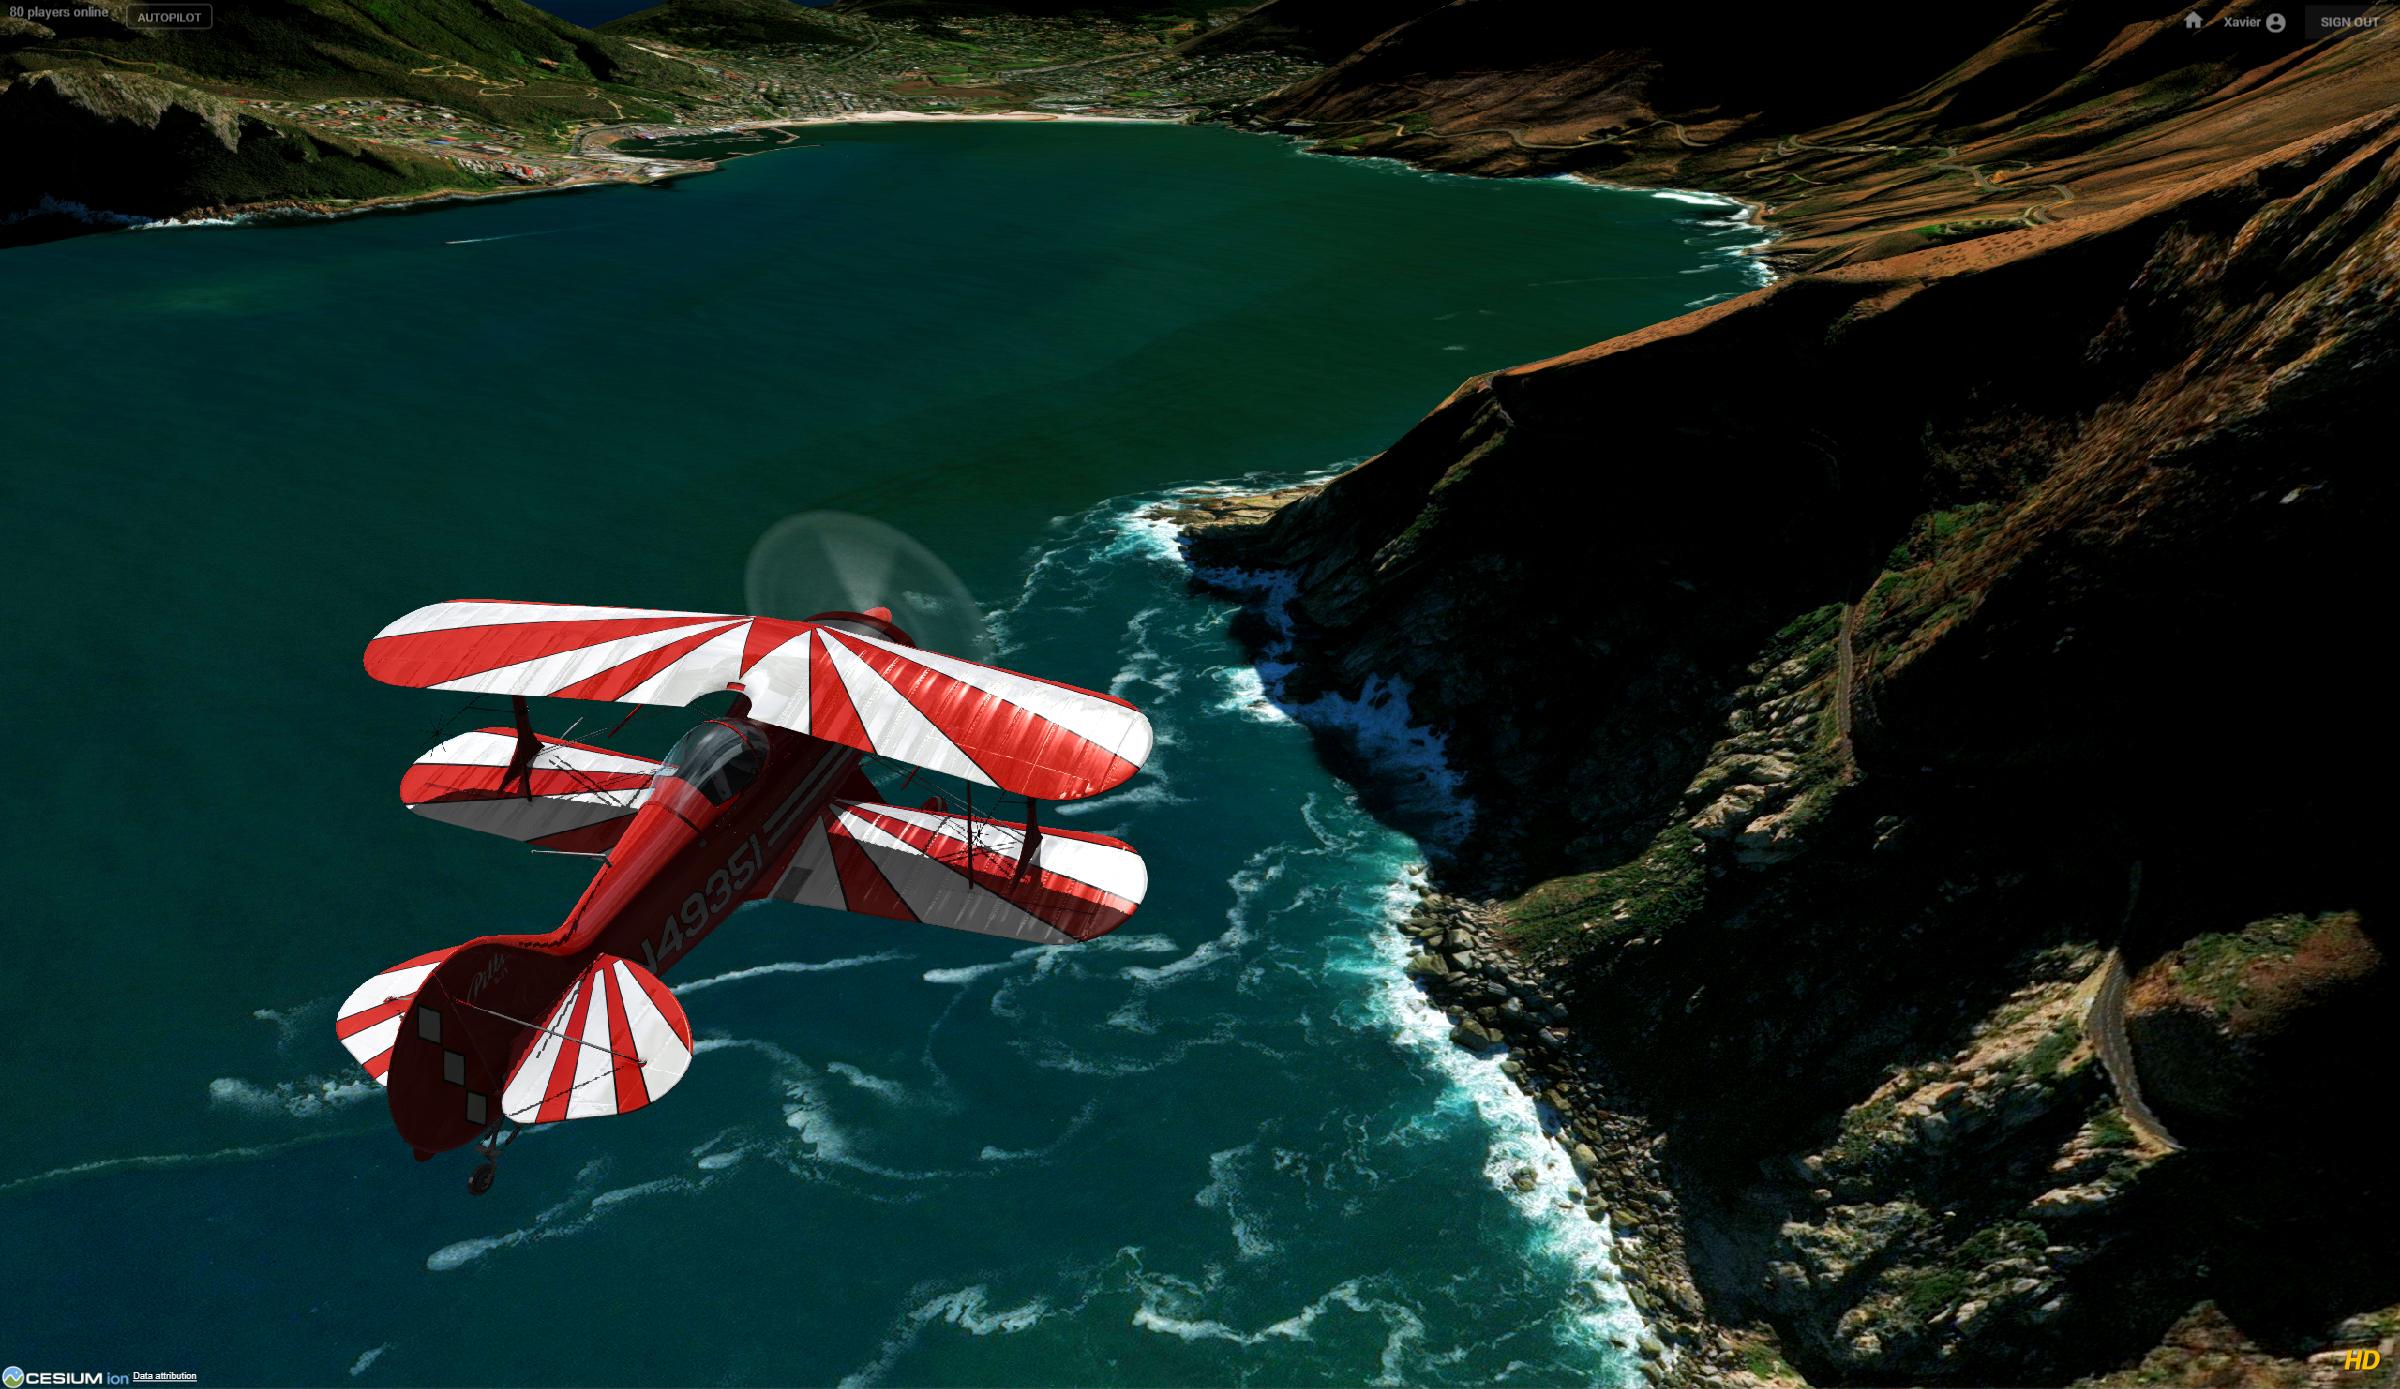 paraglider simulator google earth